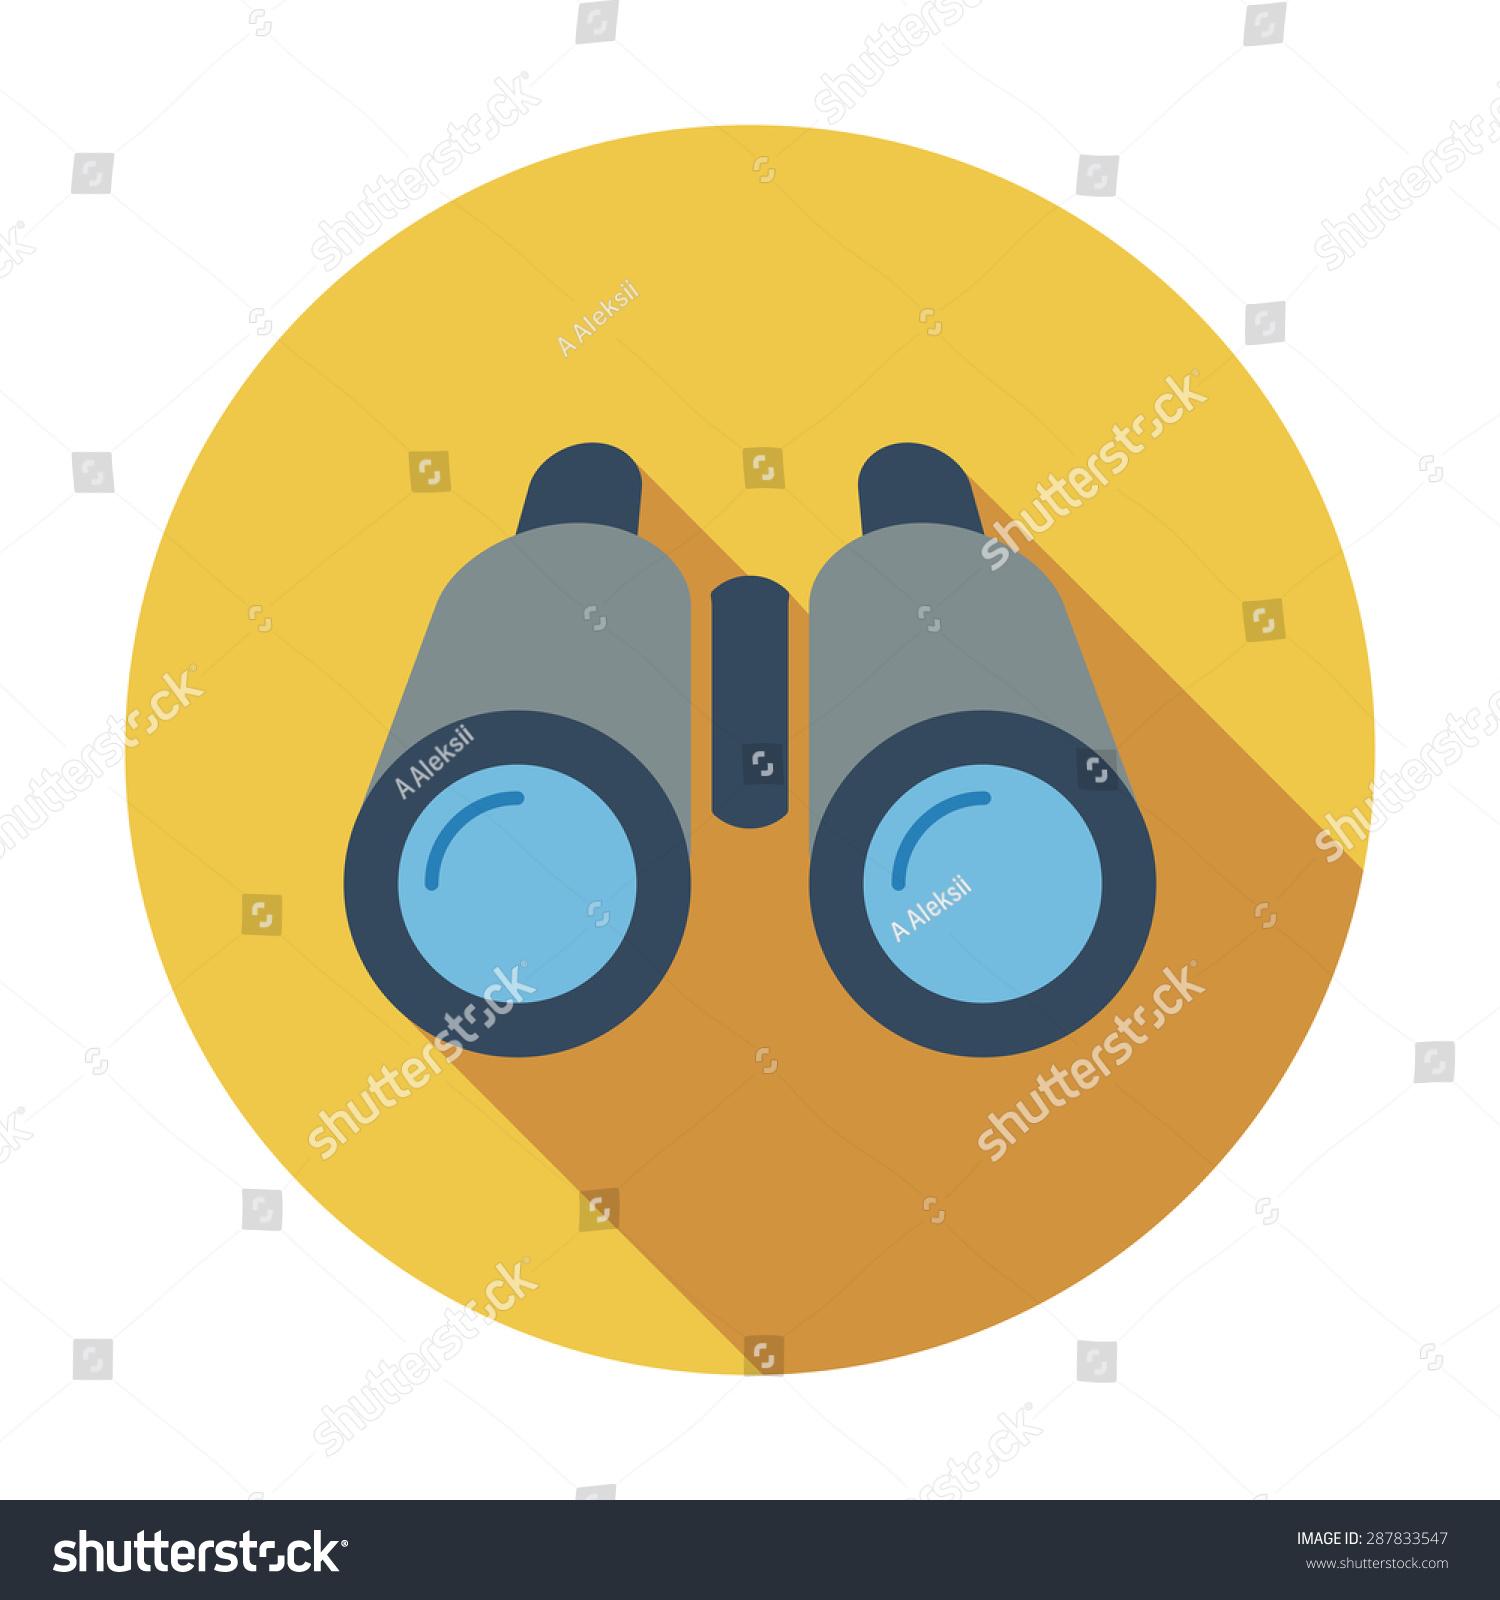 binoculars icon flat - photo #6